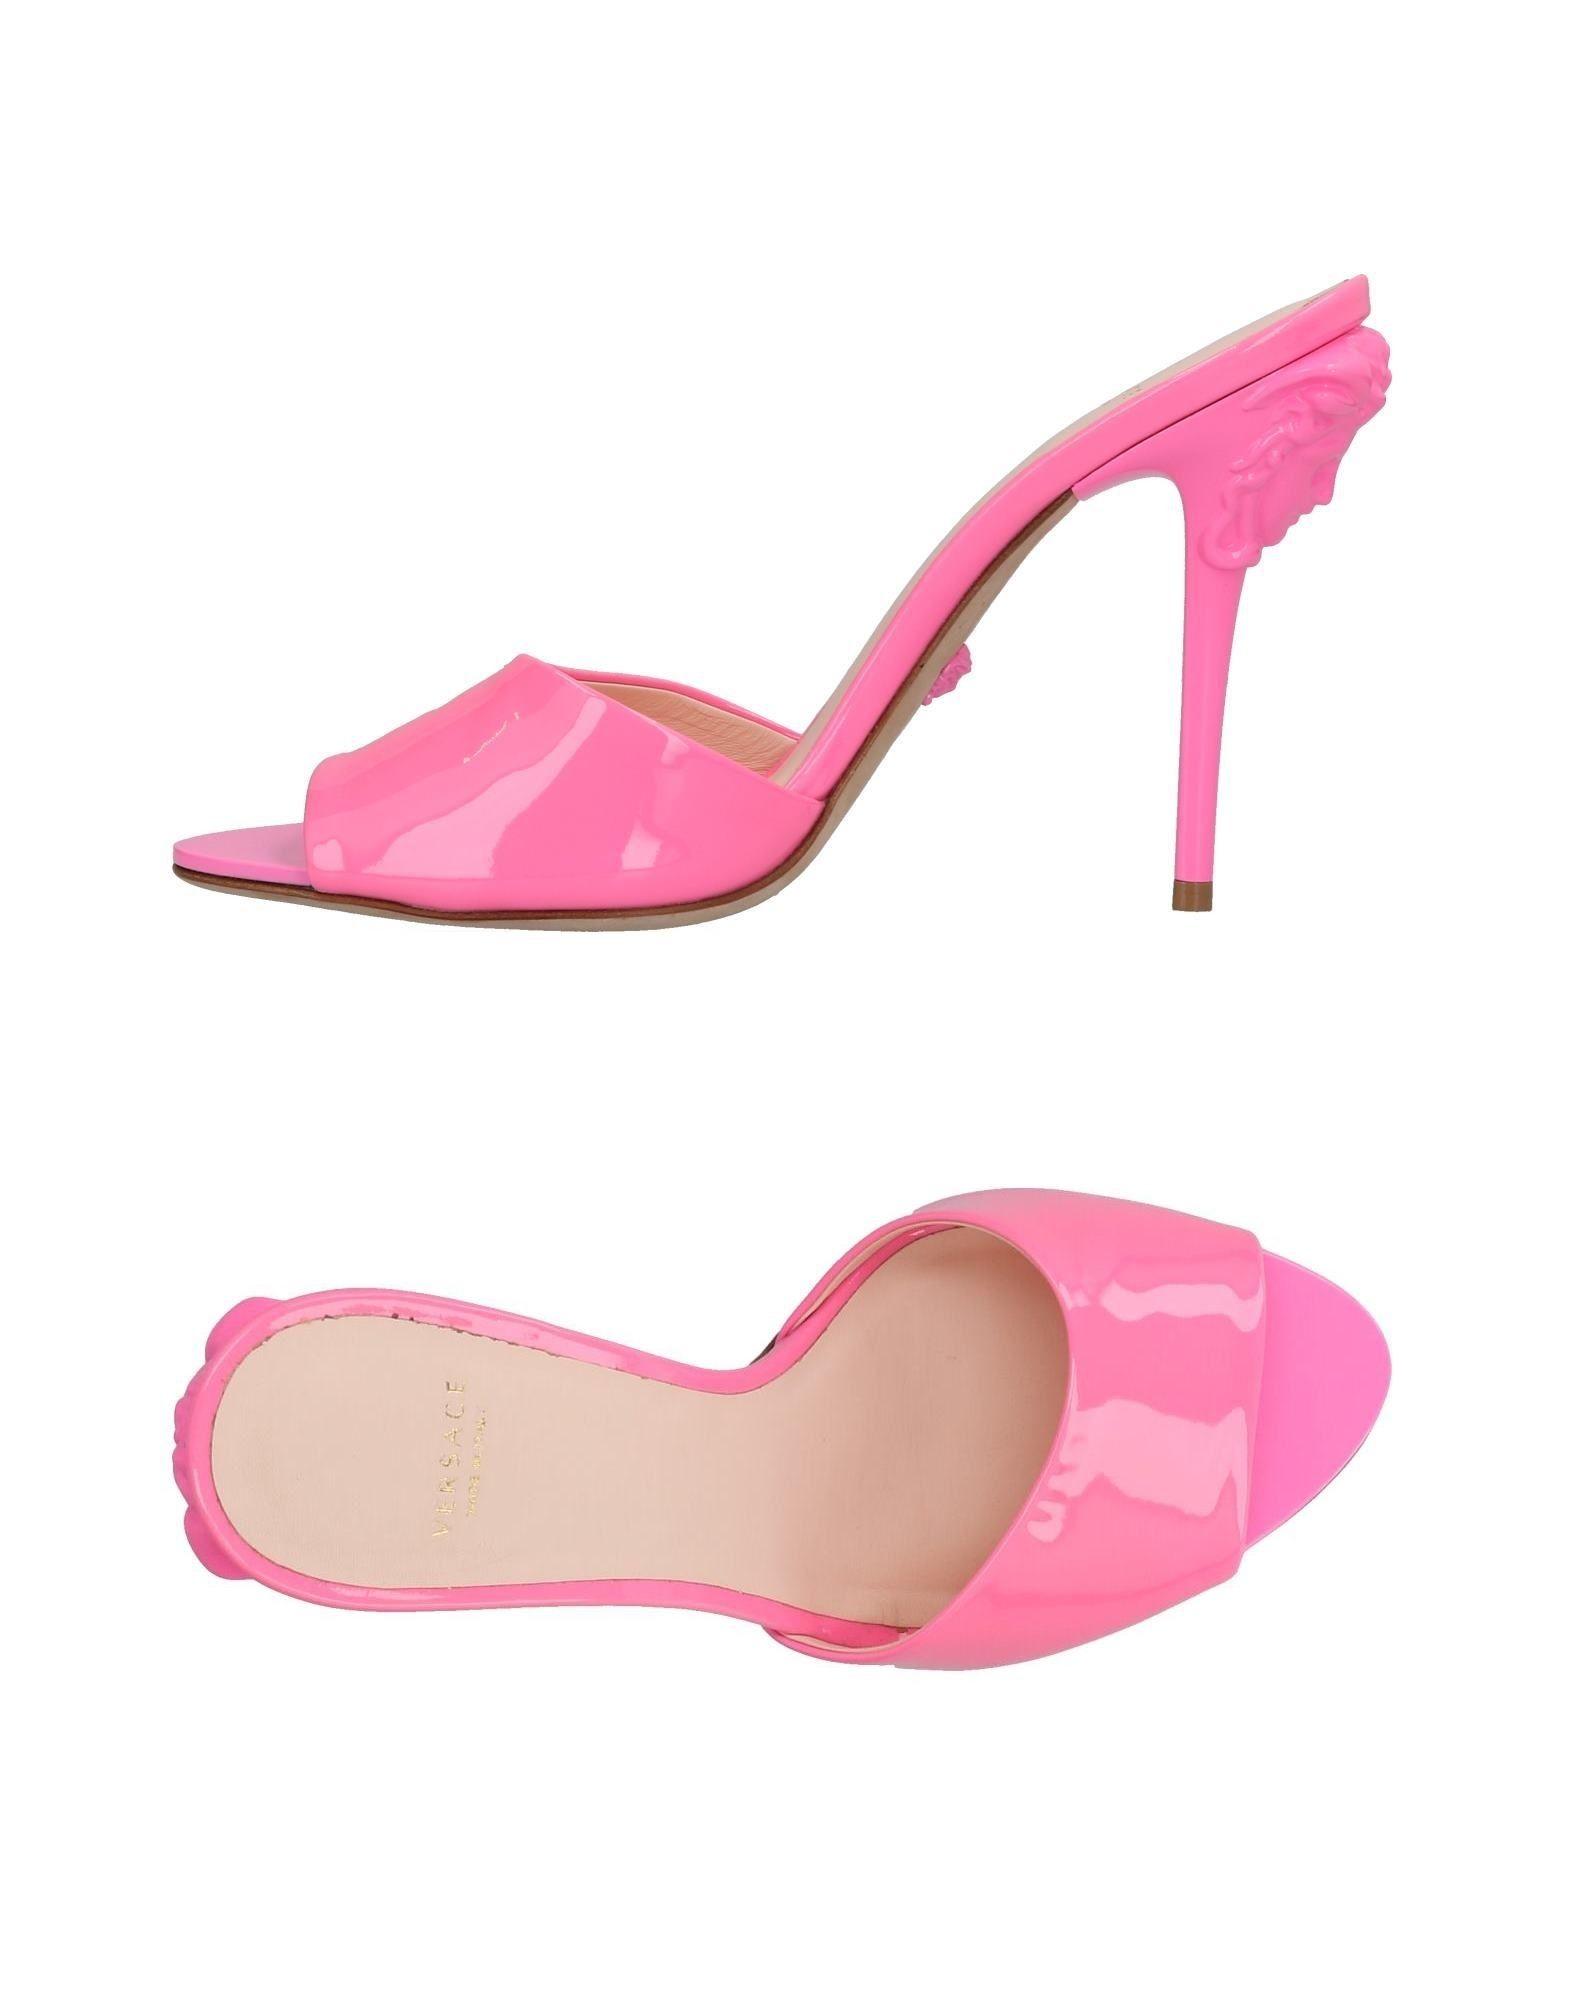 Sandales Versace Femme - Sandales Versace sur